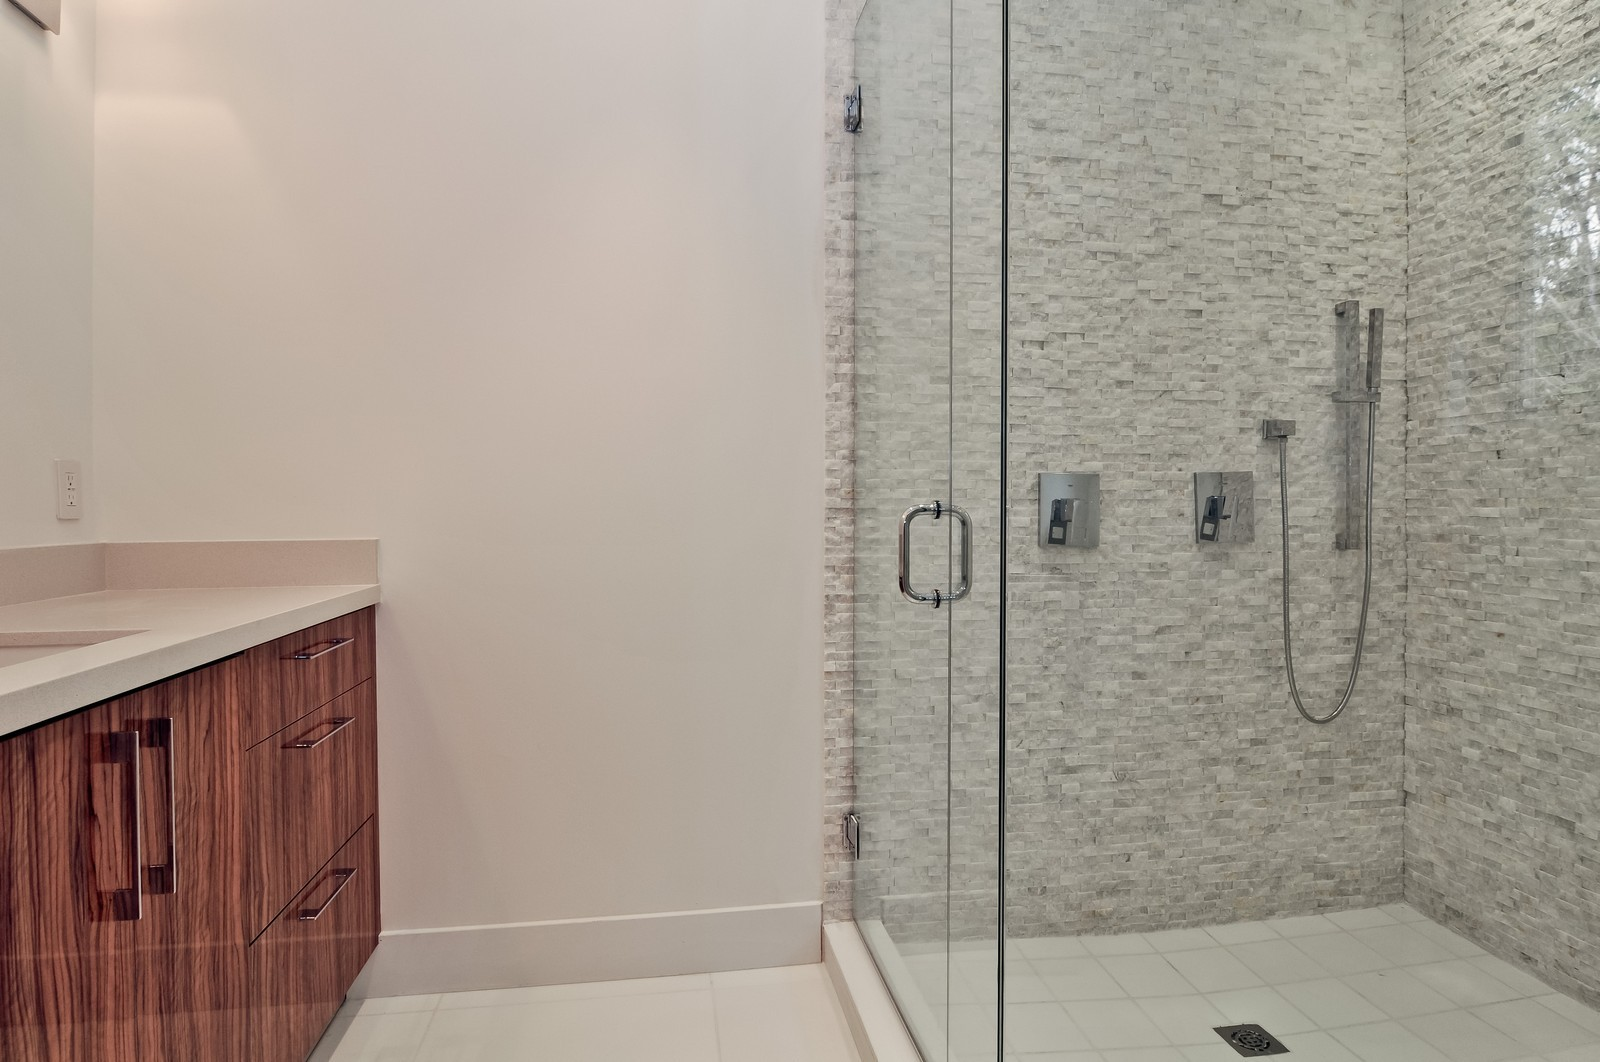 Real Estate Photography - 3645 Battersea, Miami, FL, 33133 - Master Bathroom